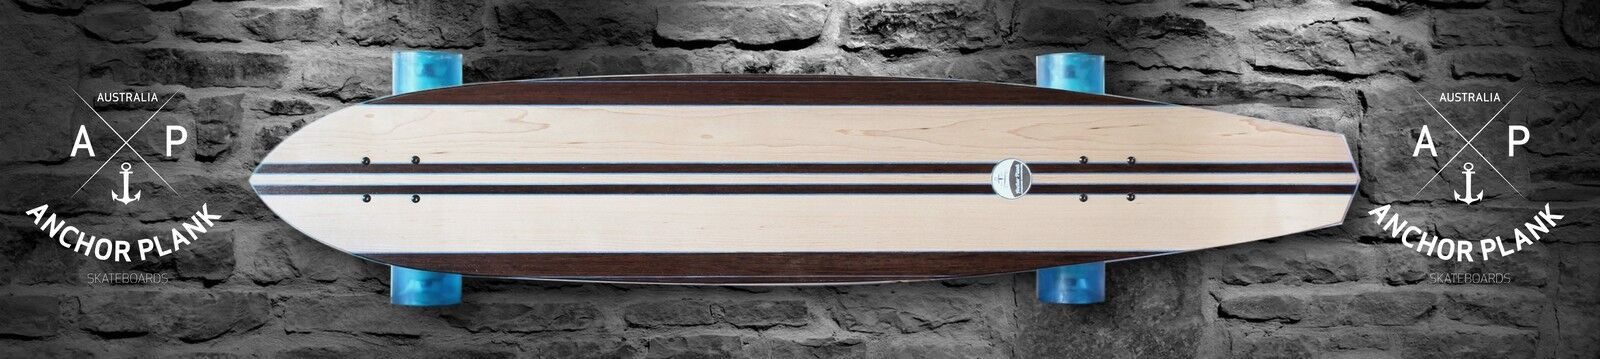 Anchor Plank Skateboards